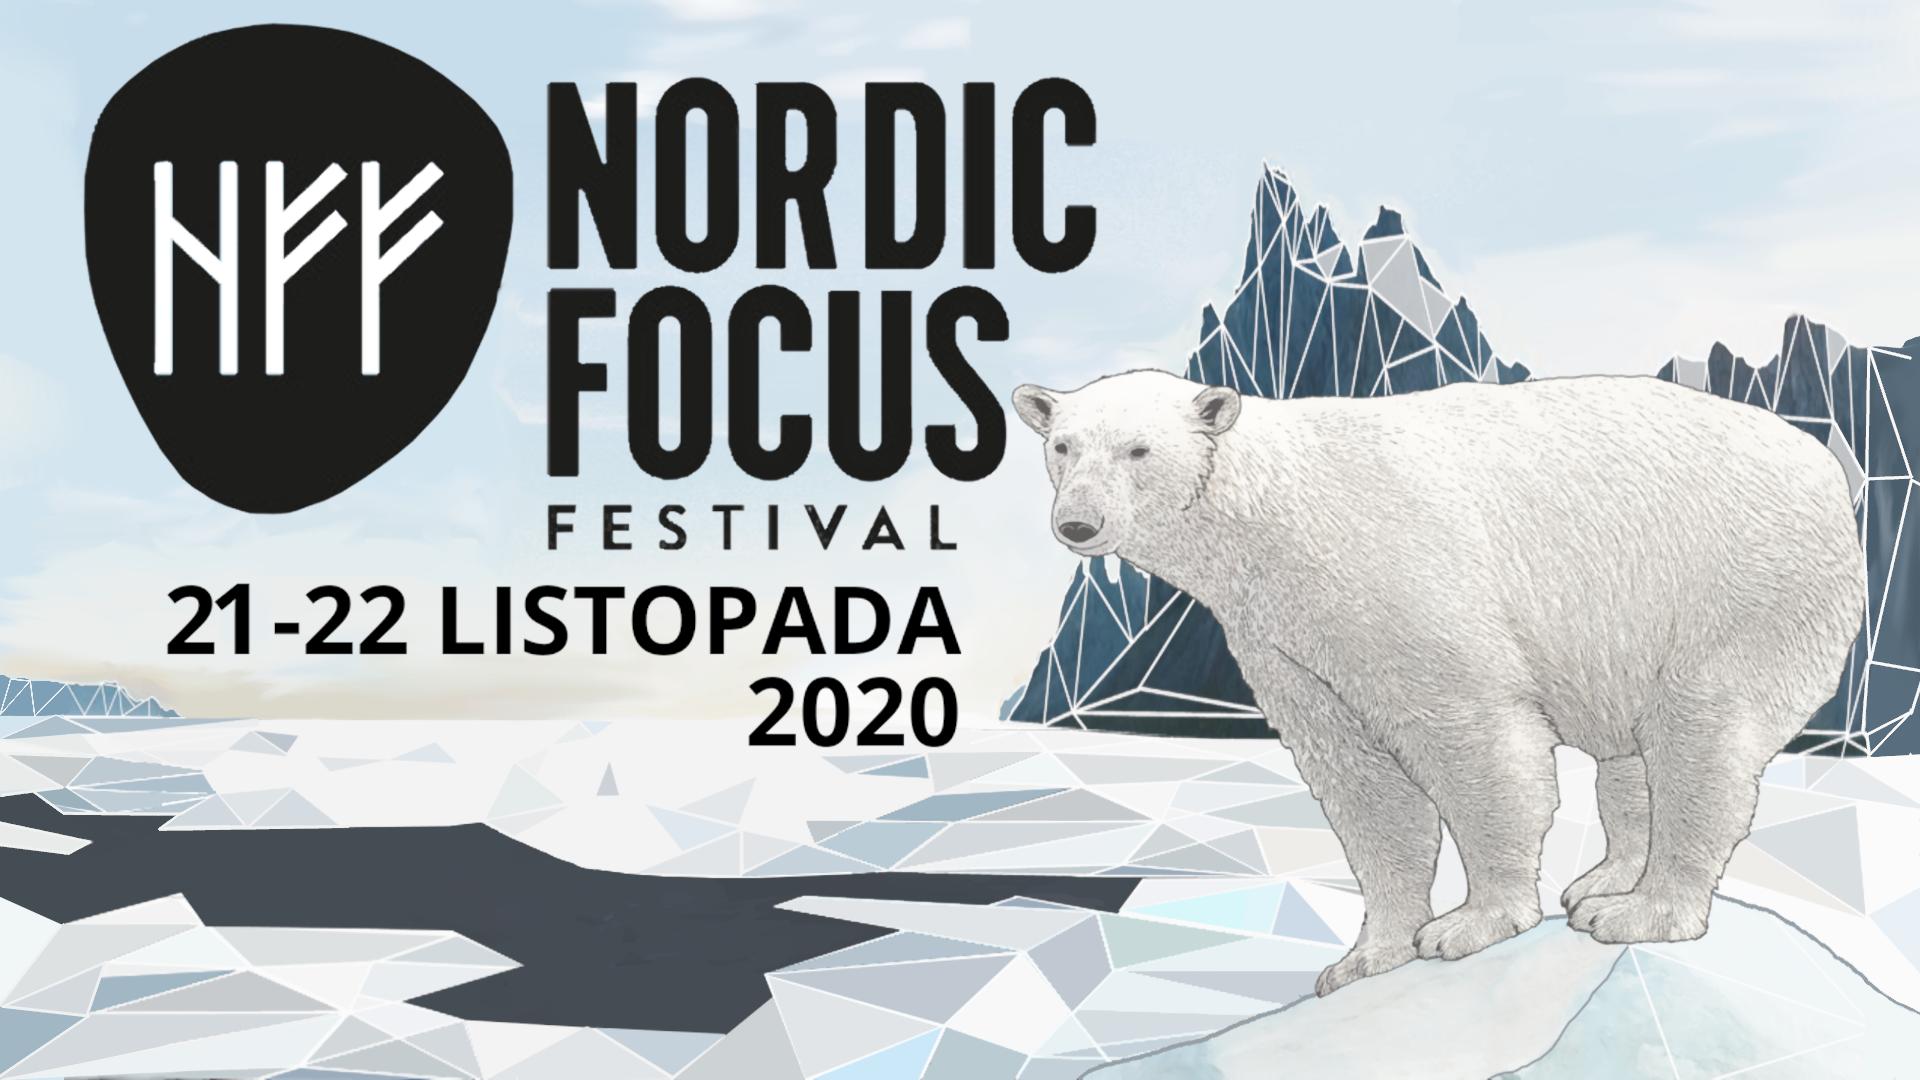 Relacja z 5. Edycji Nordic Focus Festival 2020